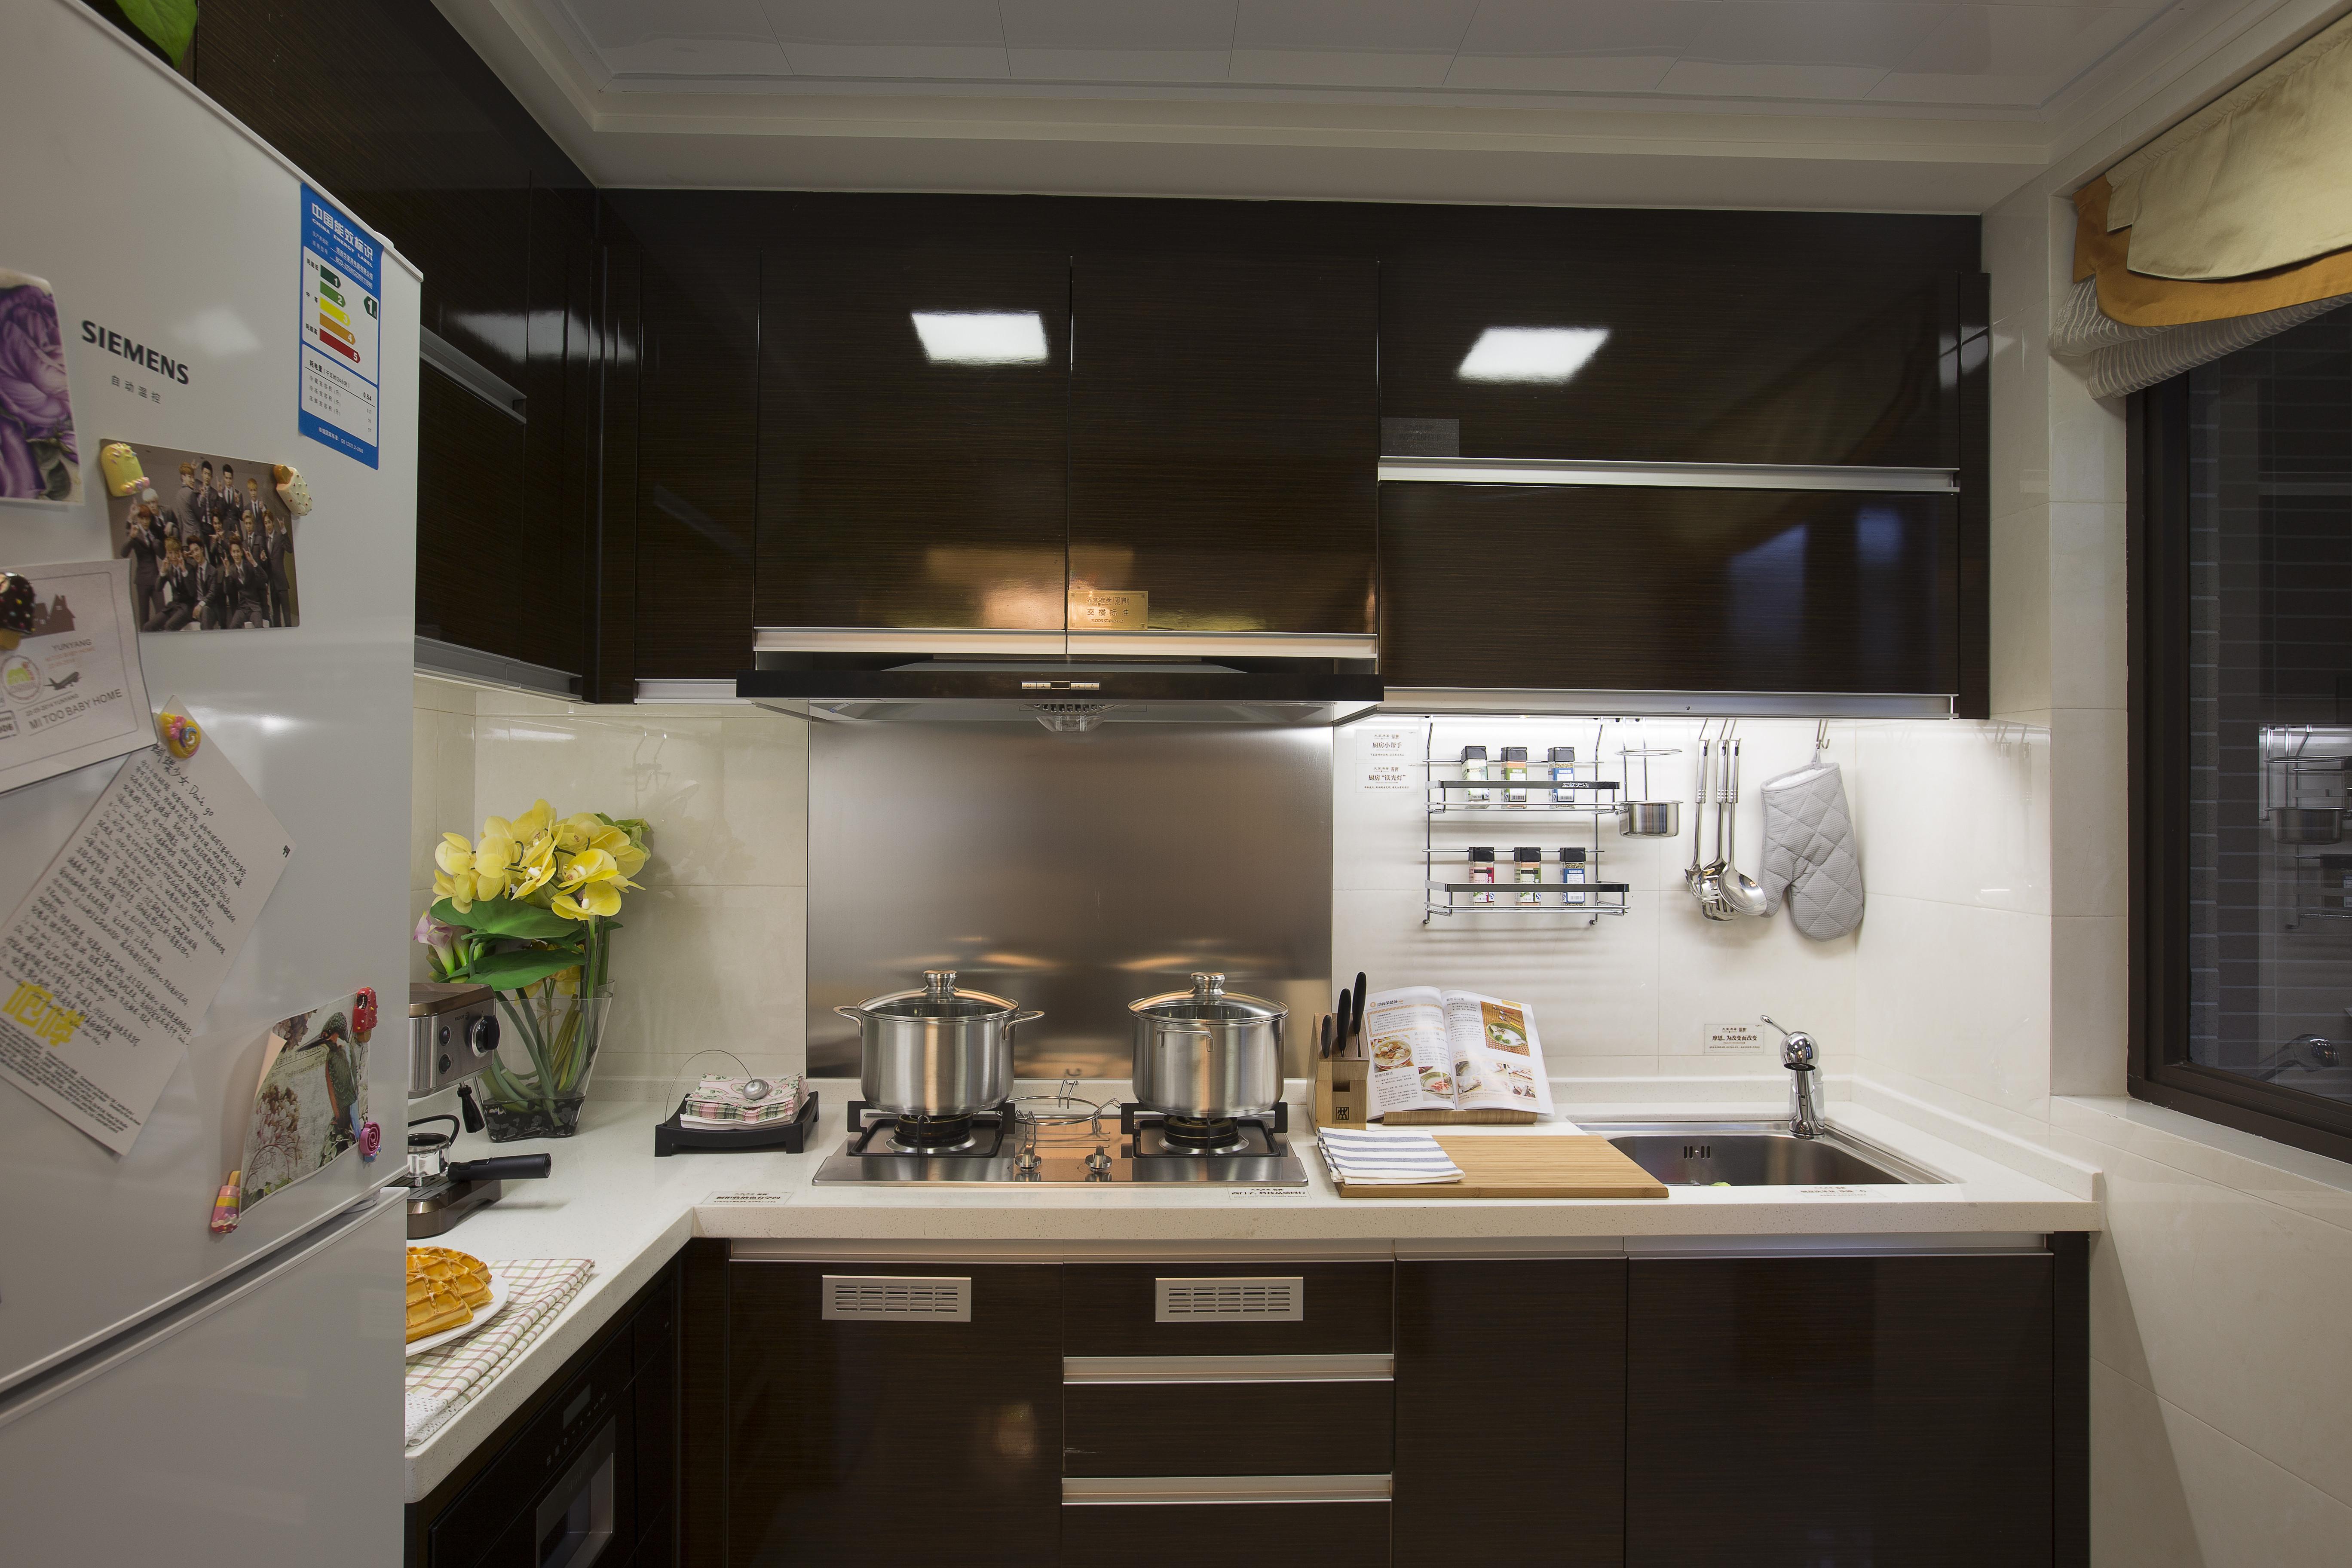 hanging kitchen light 2x4 table 【超强装修攻略】如果买房 一定要这样装修! - 导购 -广州乐居网